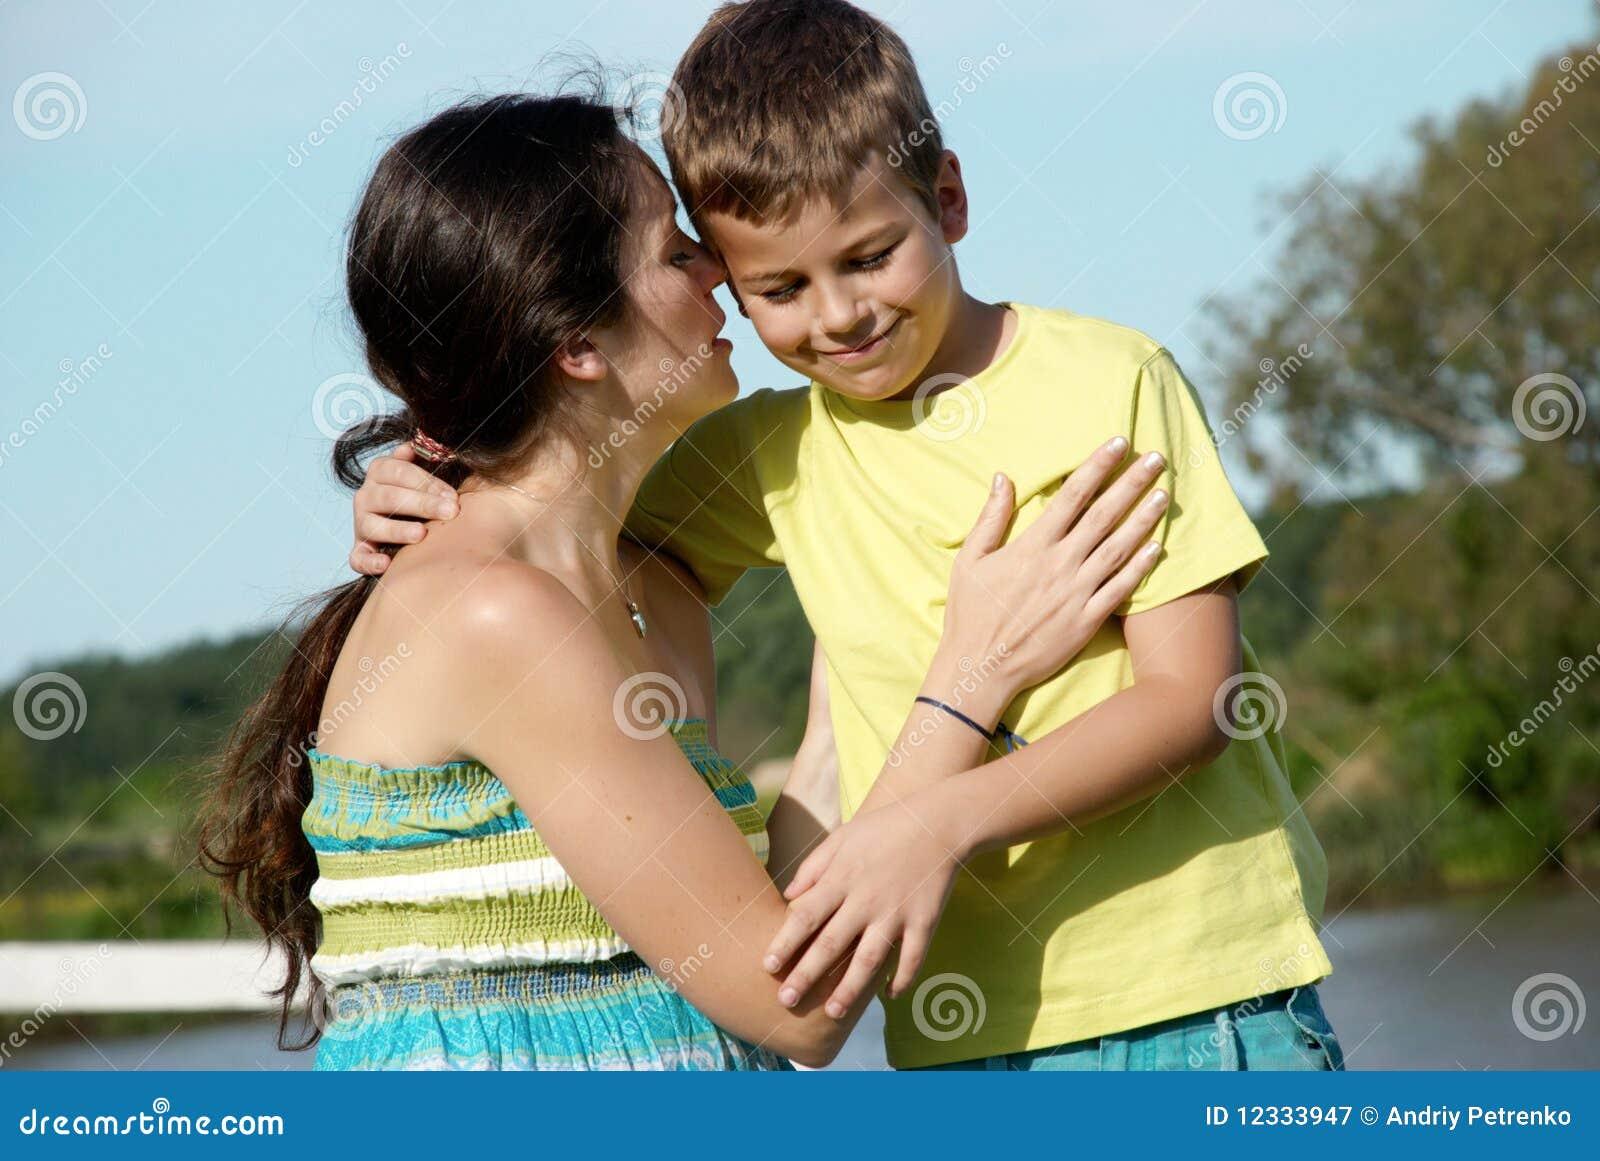 Матушка и сынок фото 304-81